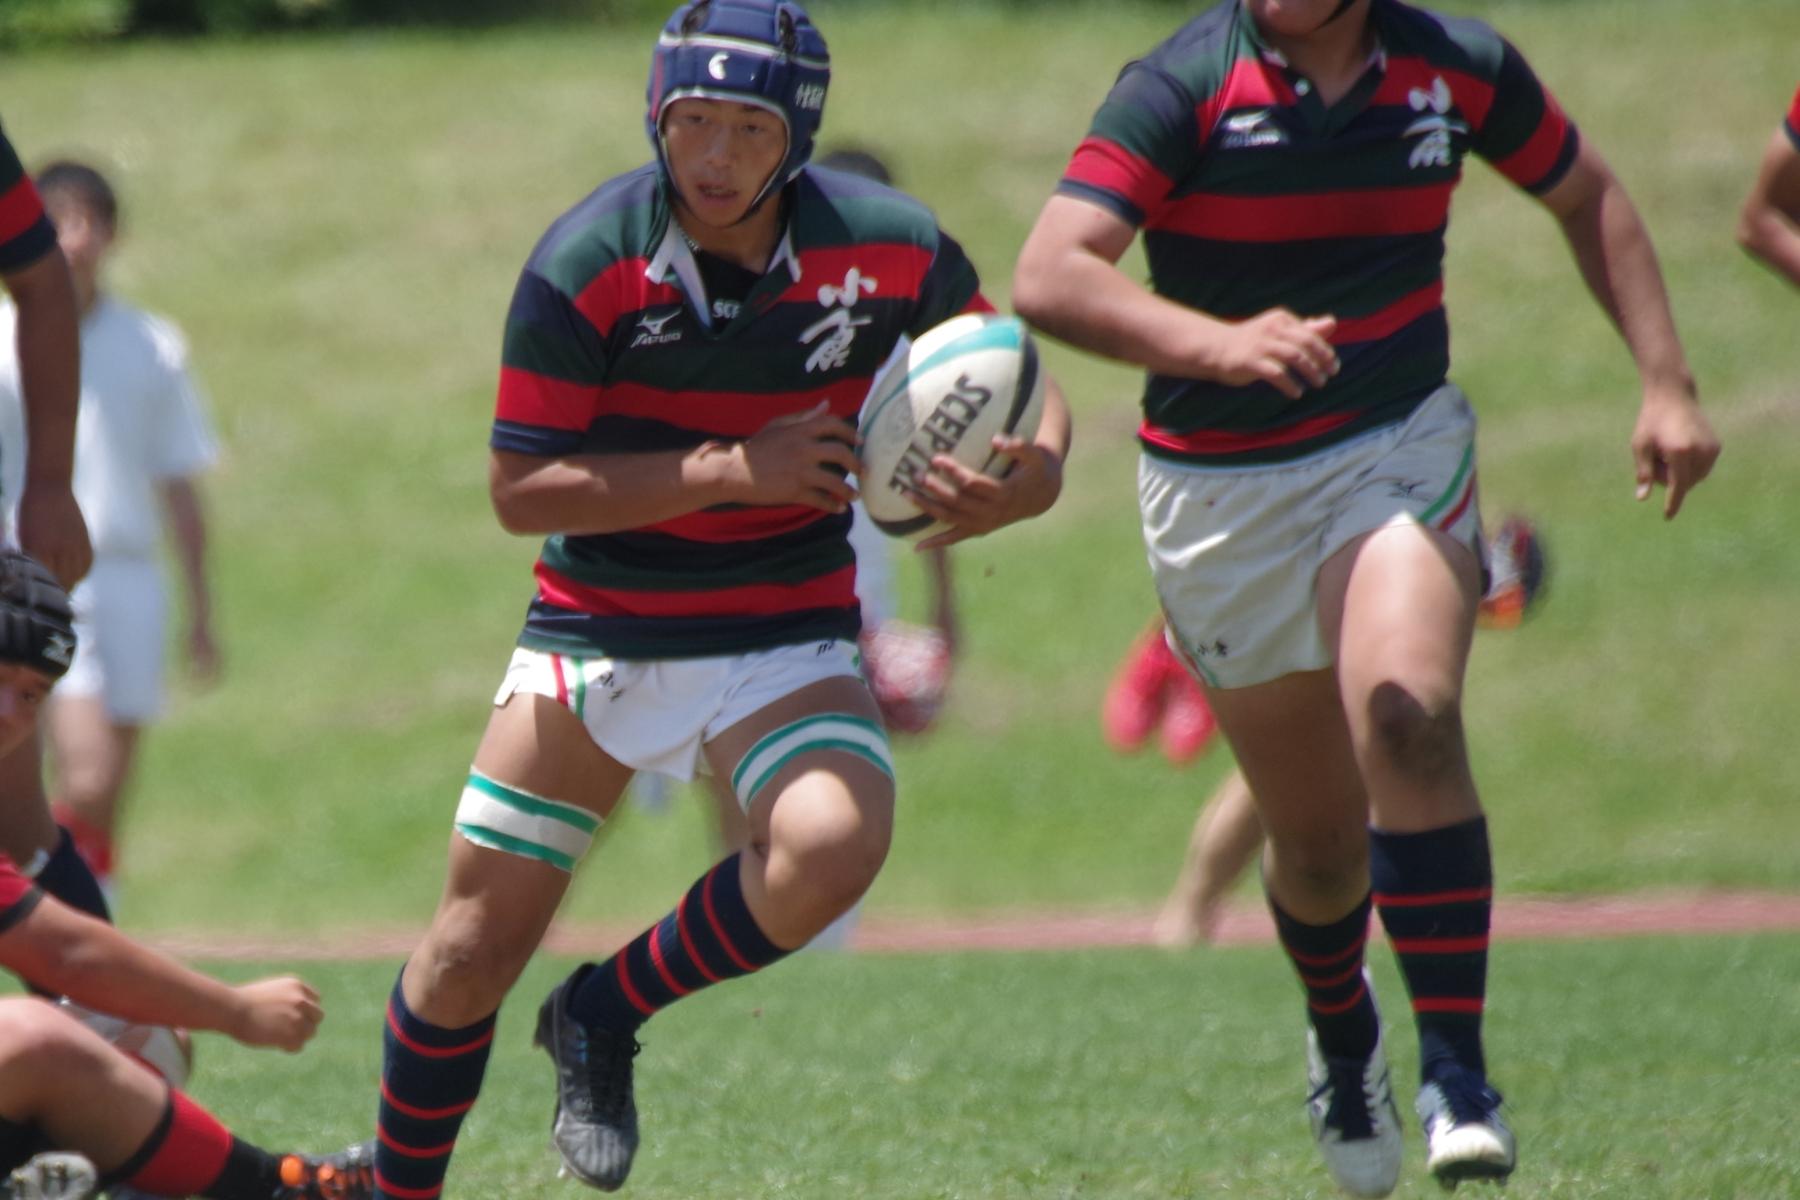 http://kokura-rugby.sakura.ne.jp/180520_124524_0383.jpg